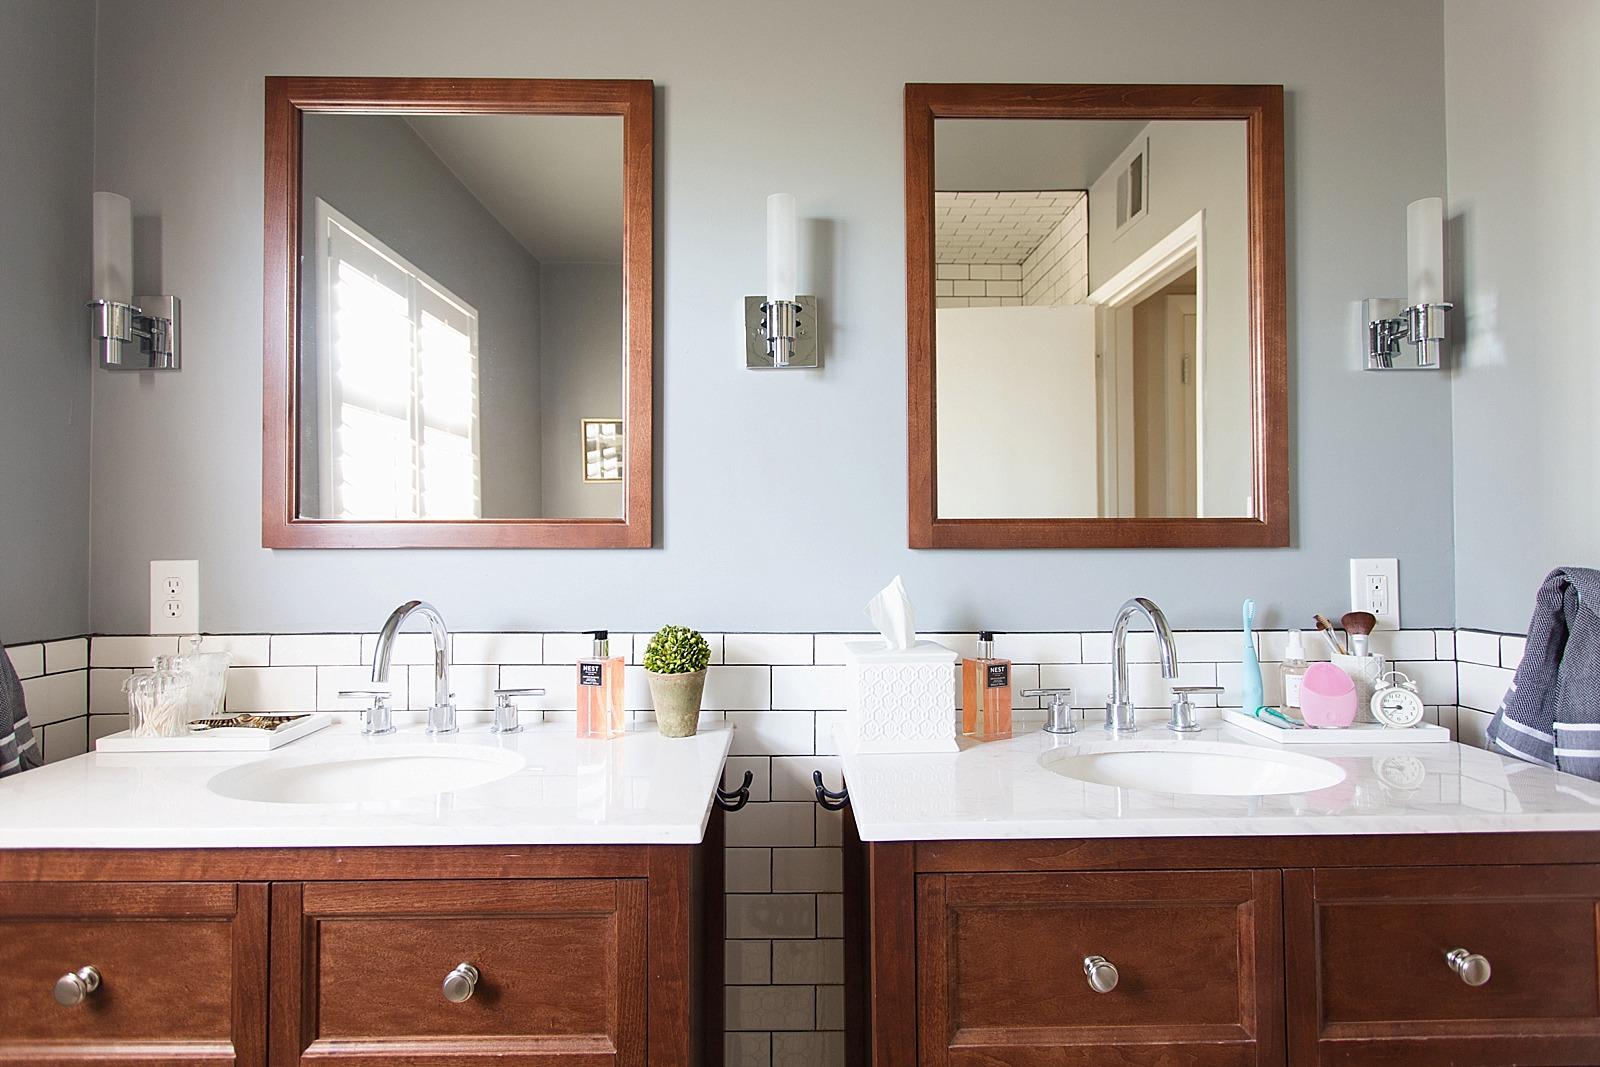 ... White Subway Tile With Dark Black Grout Bathroom Jonathan Adler Touches  Zebra Rug And Bathroom Refresh ...